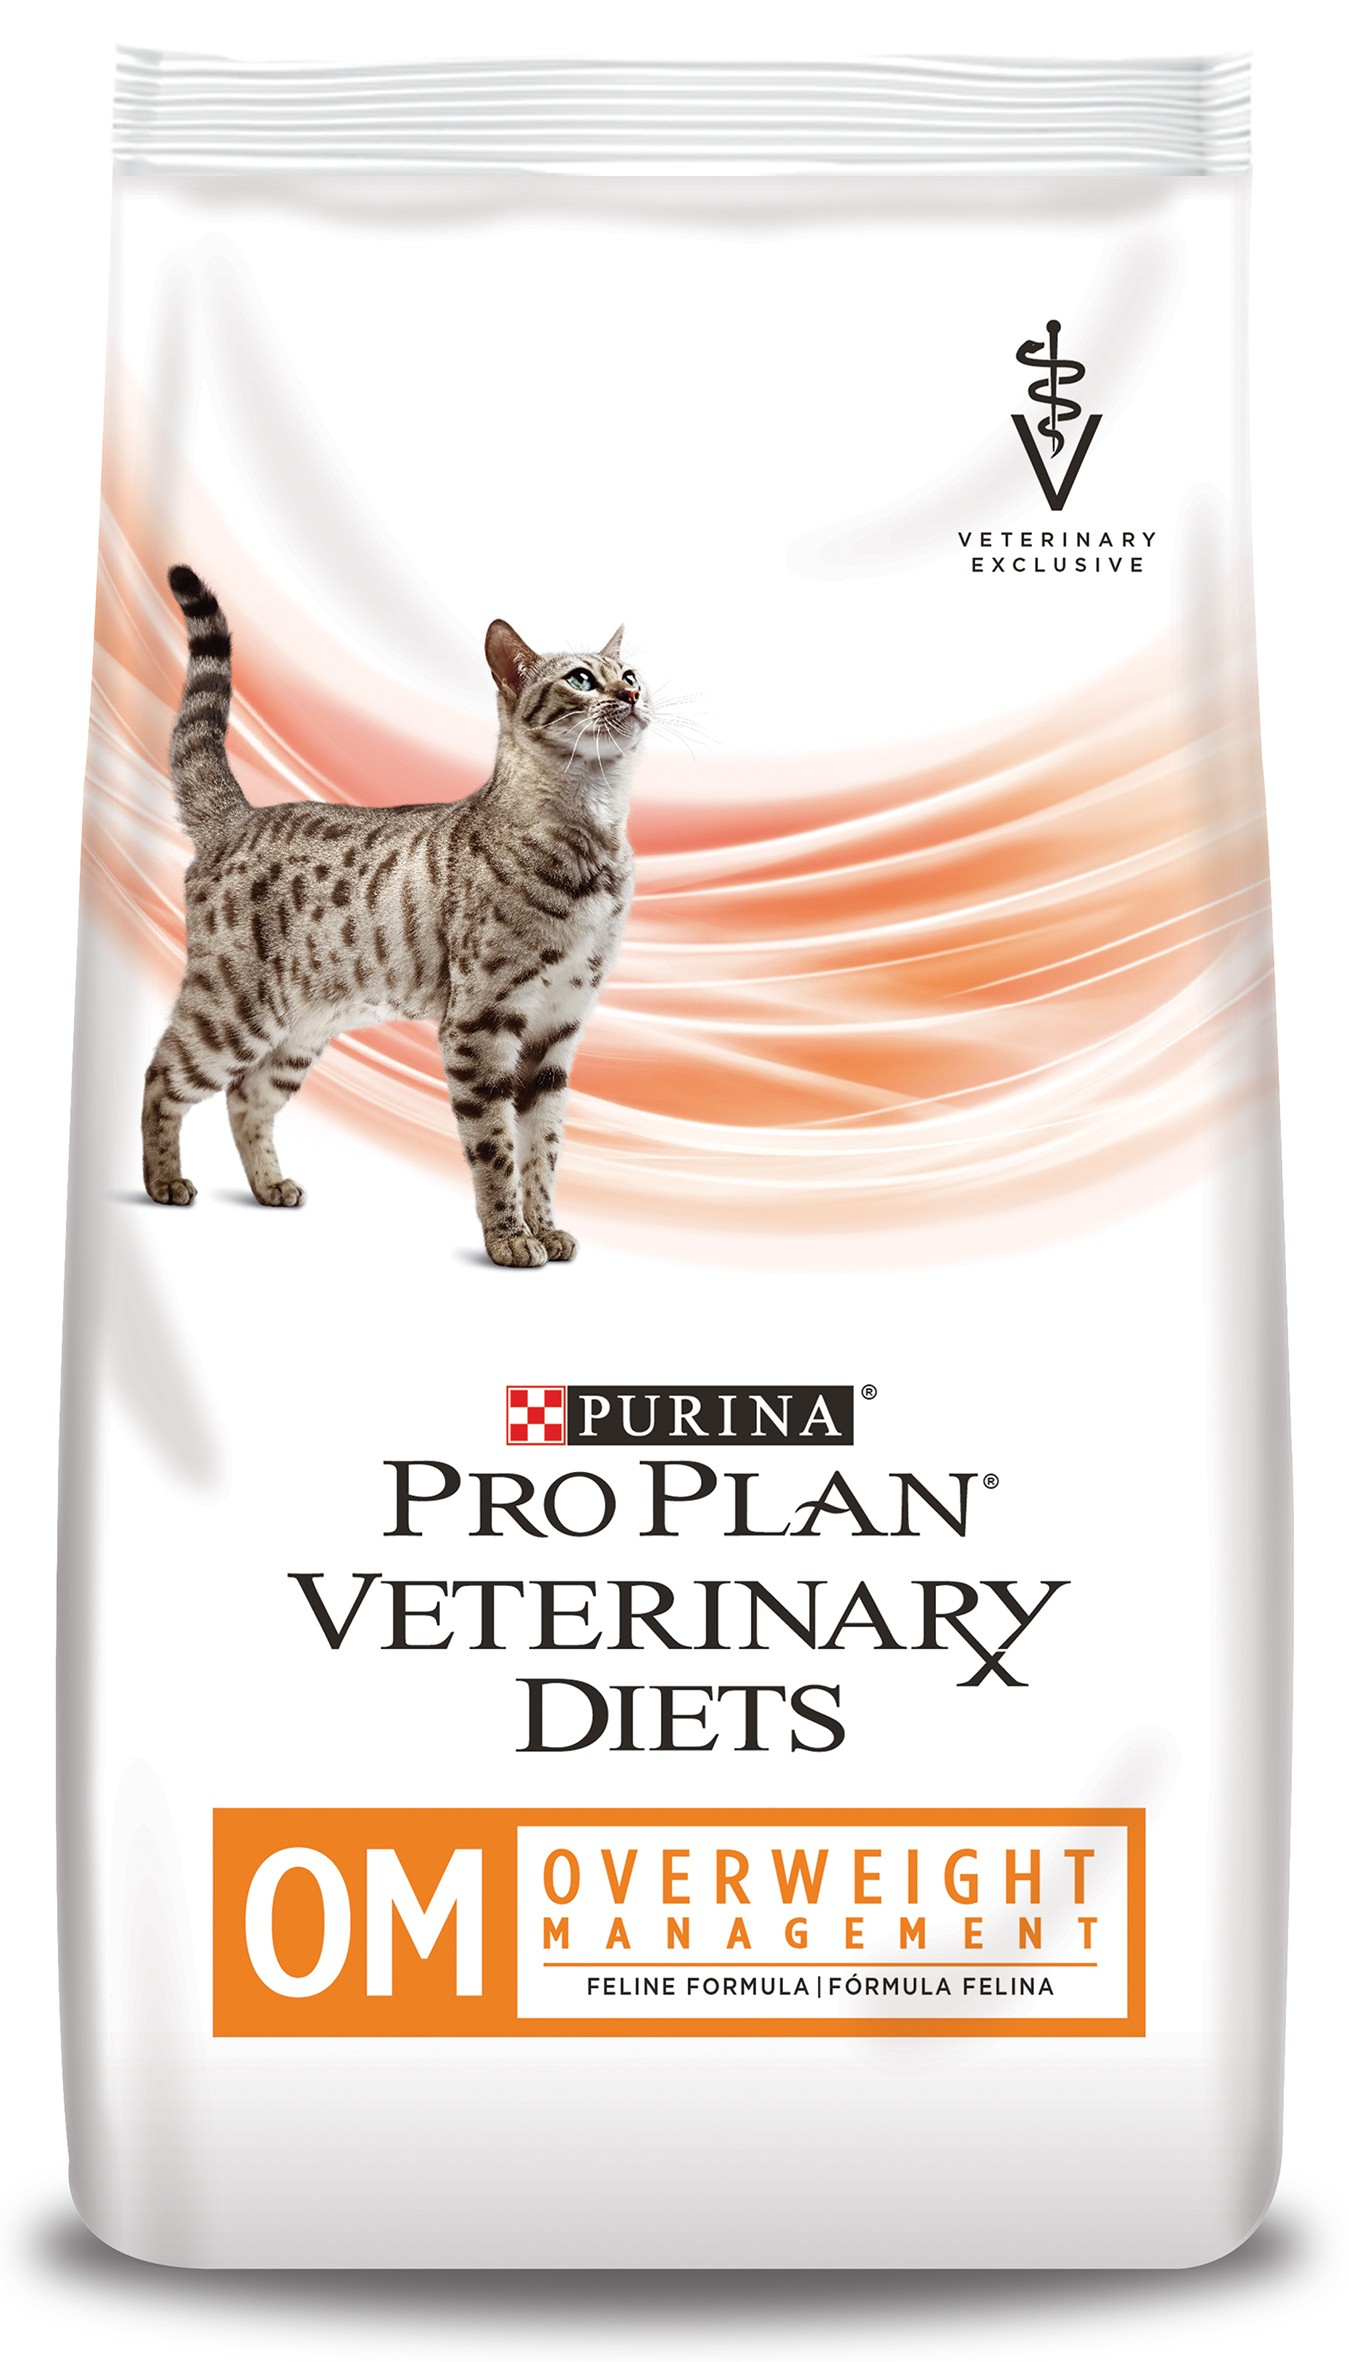 Pro Plan  OM Overweight Management Feline